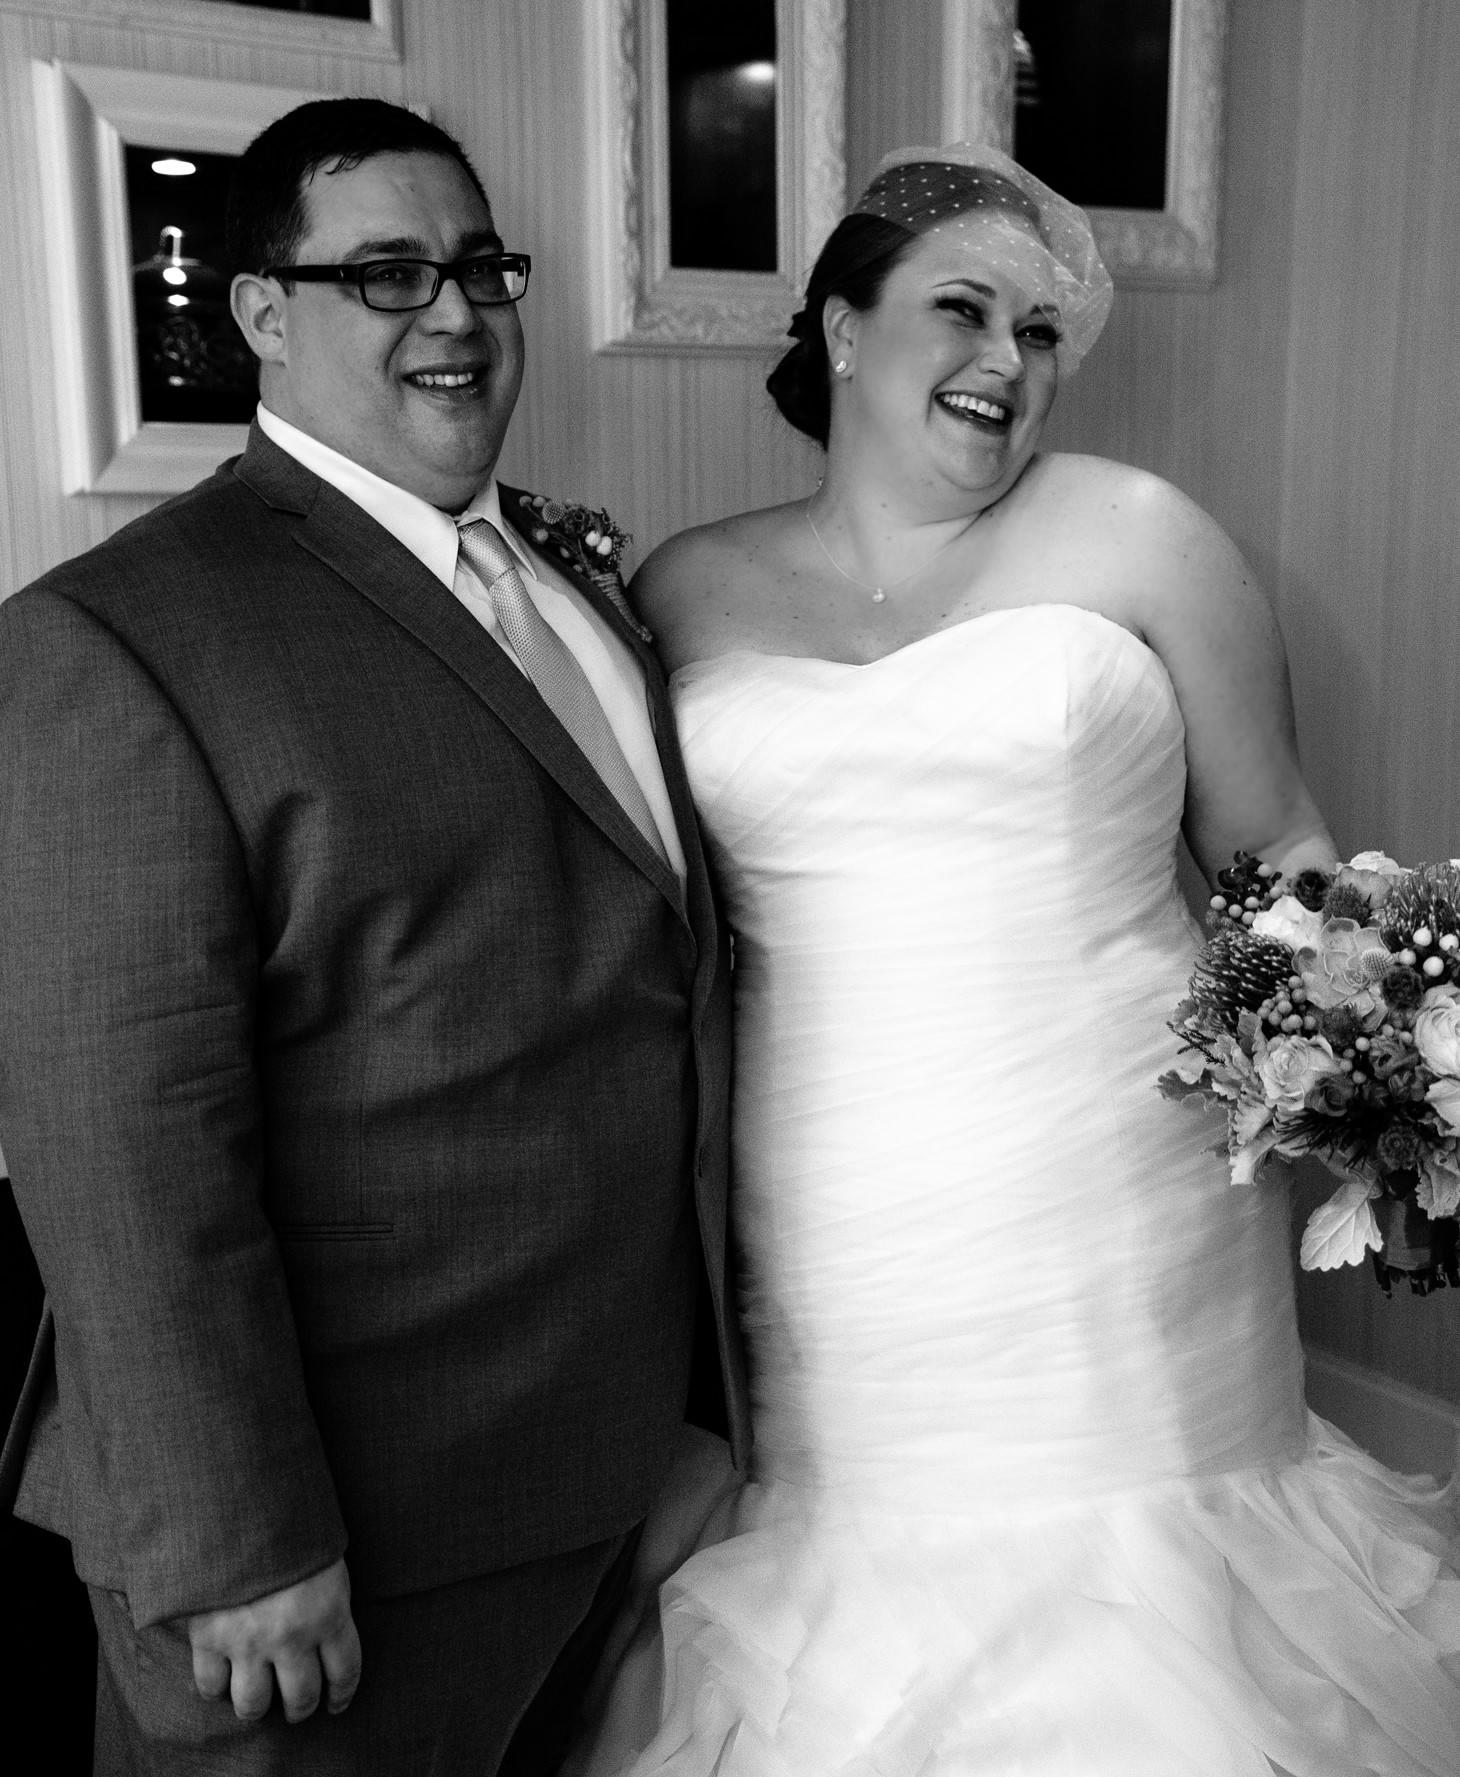 nyc-brooklyn-prospect-park-picnic-house-wedding-smitten-chickens-nerdy-23.jpg